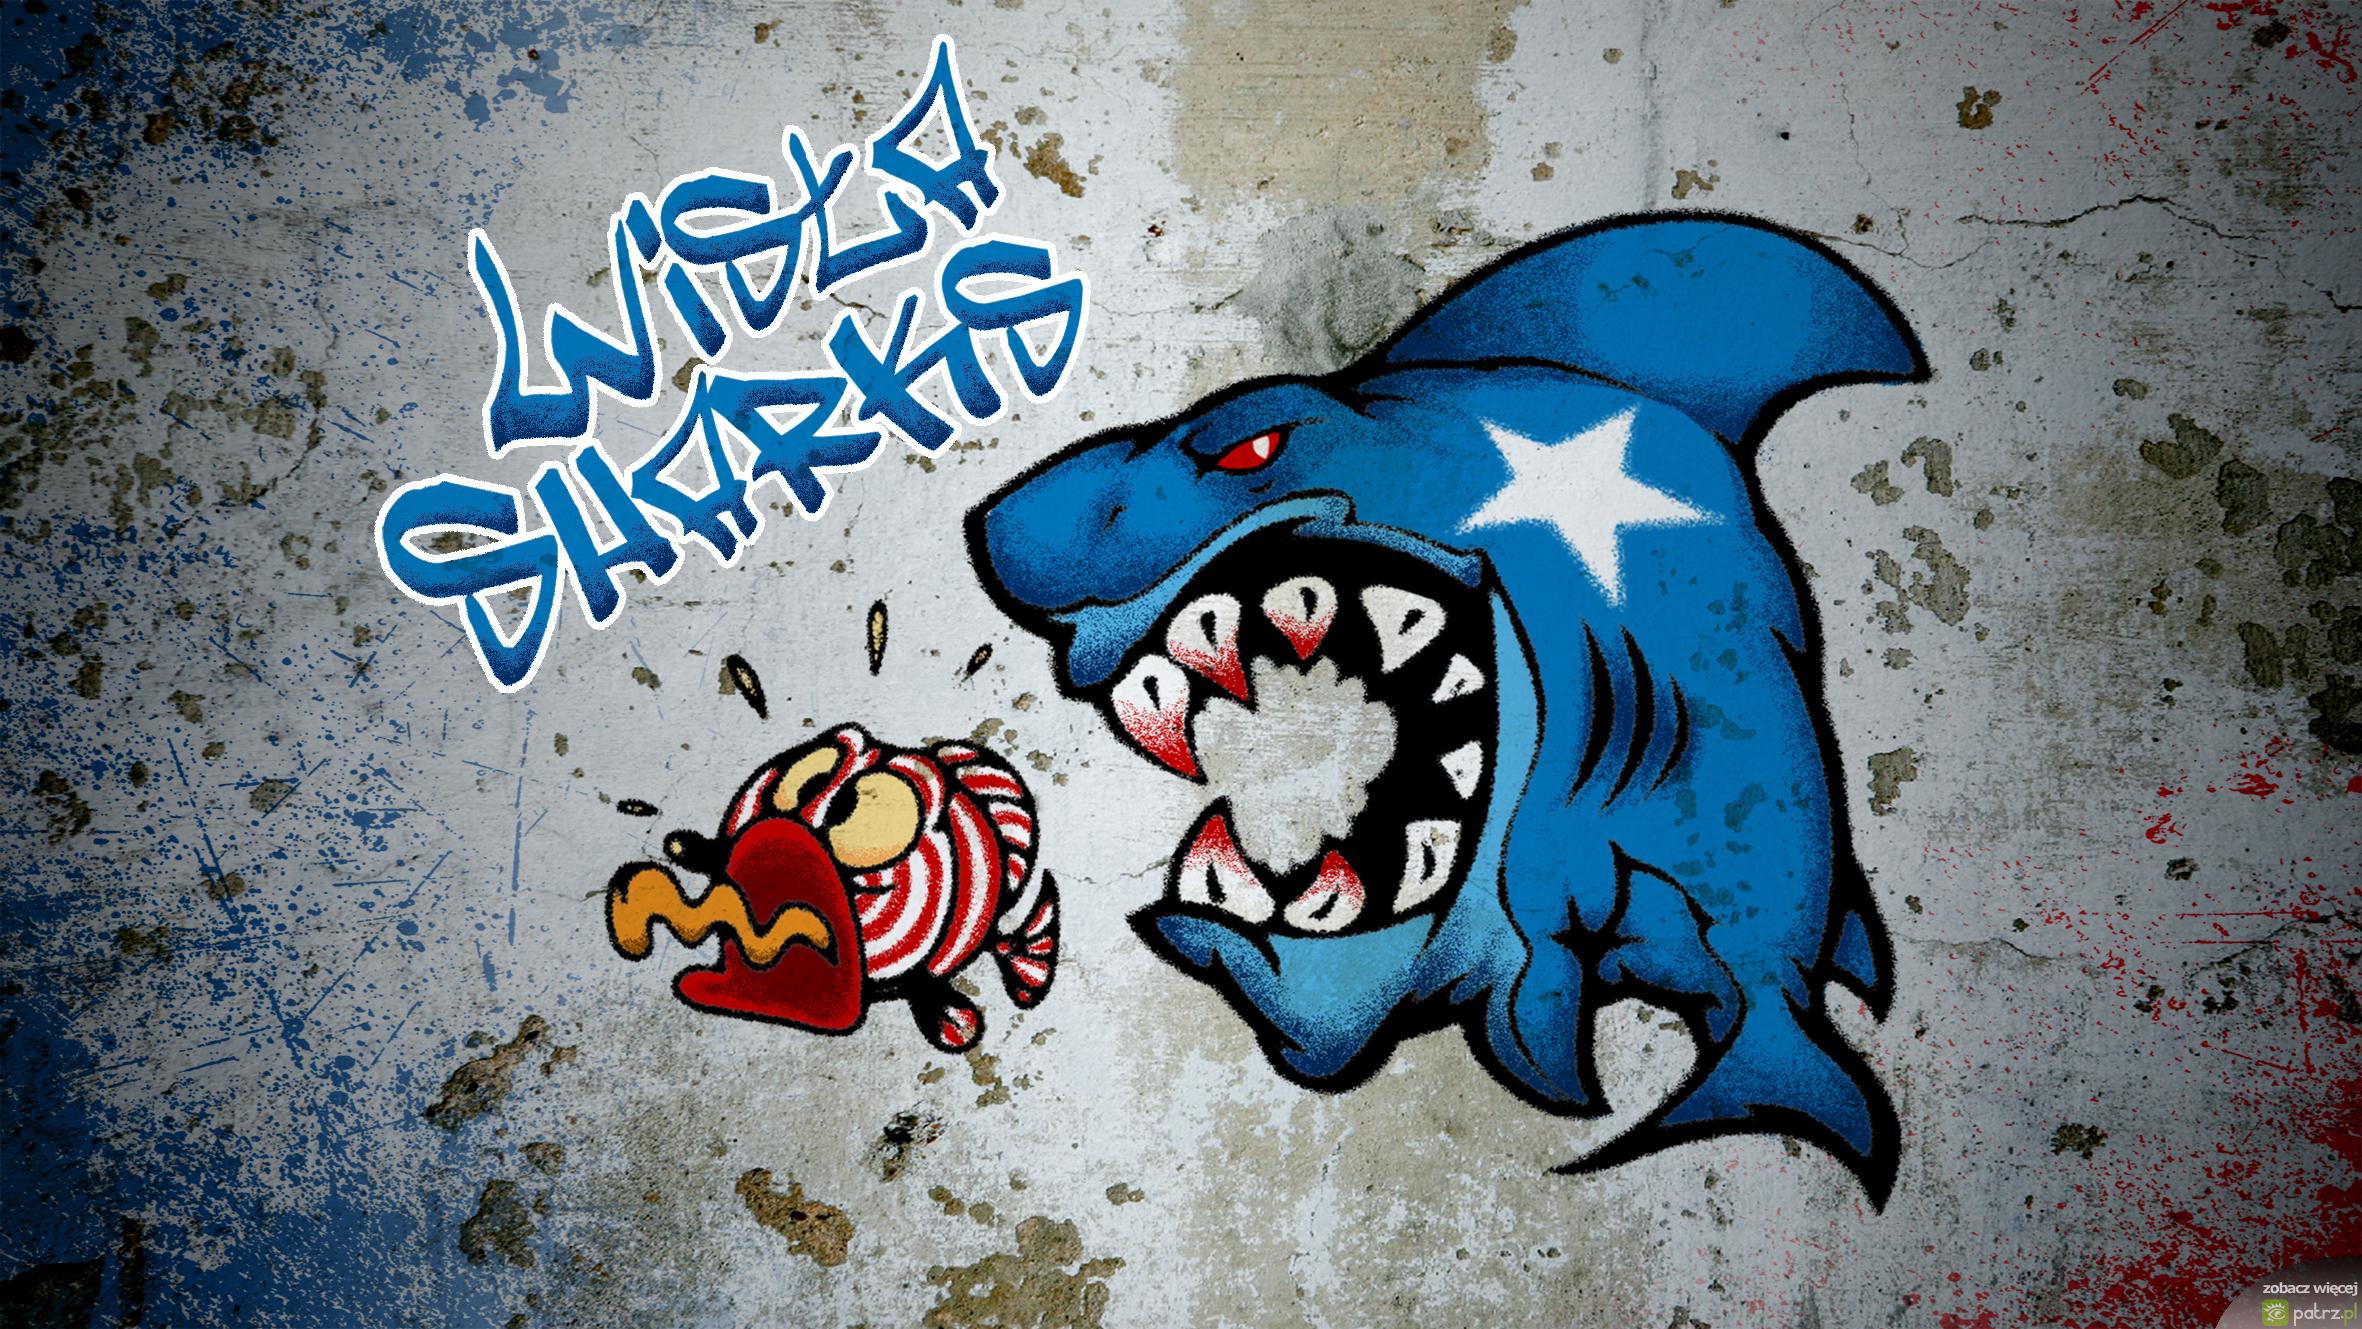 Wisla Sharks